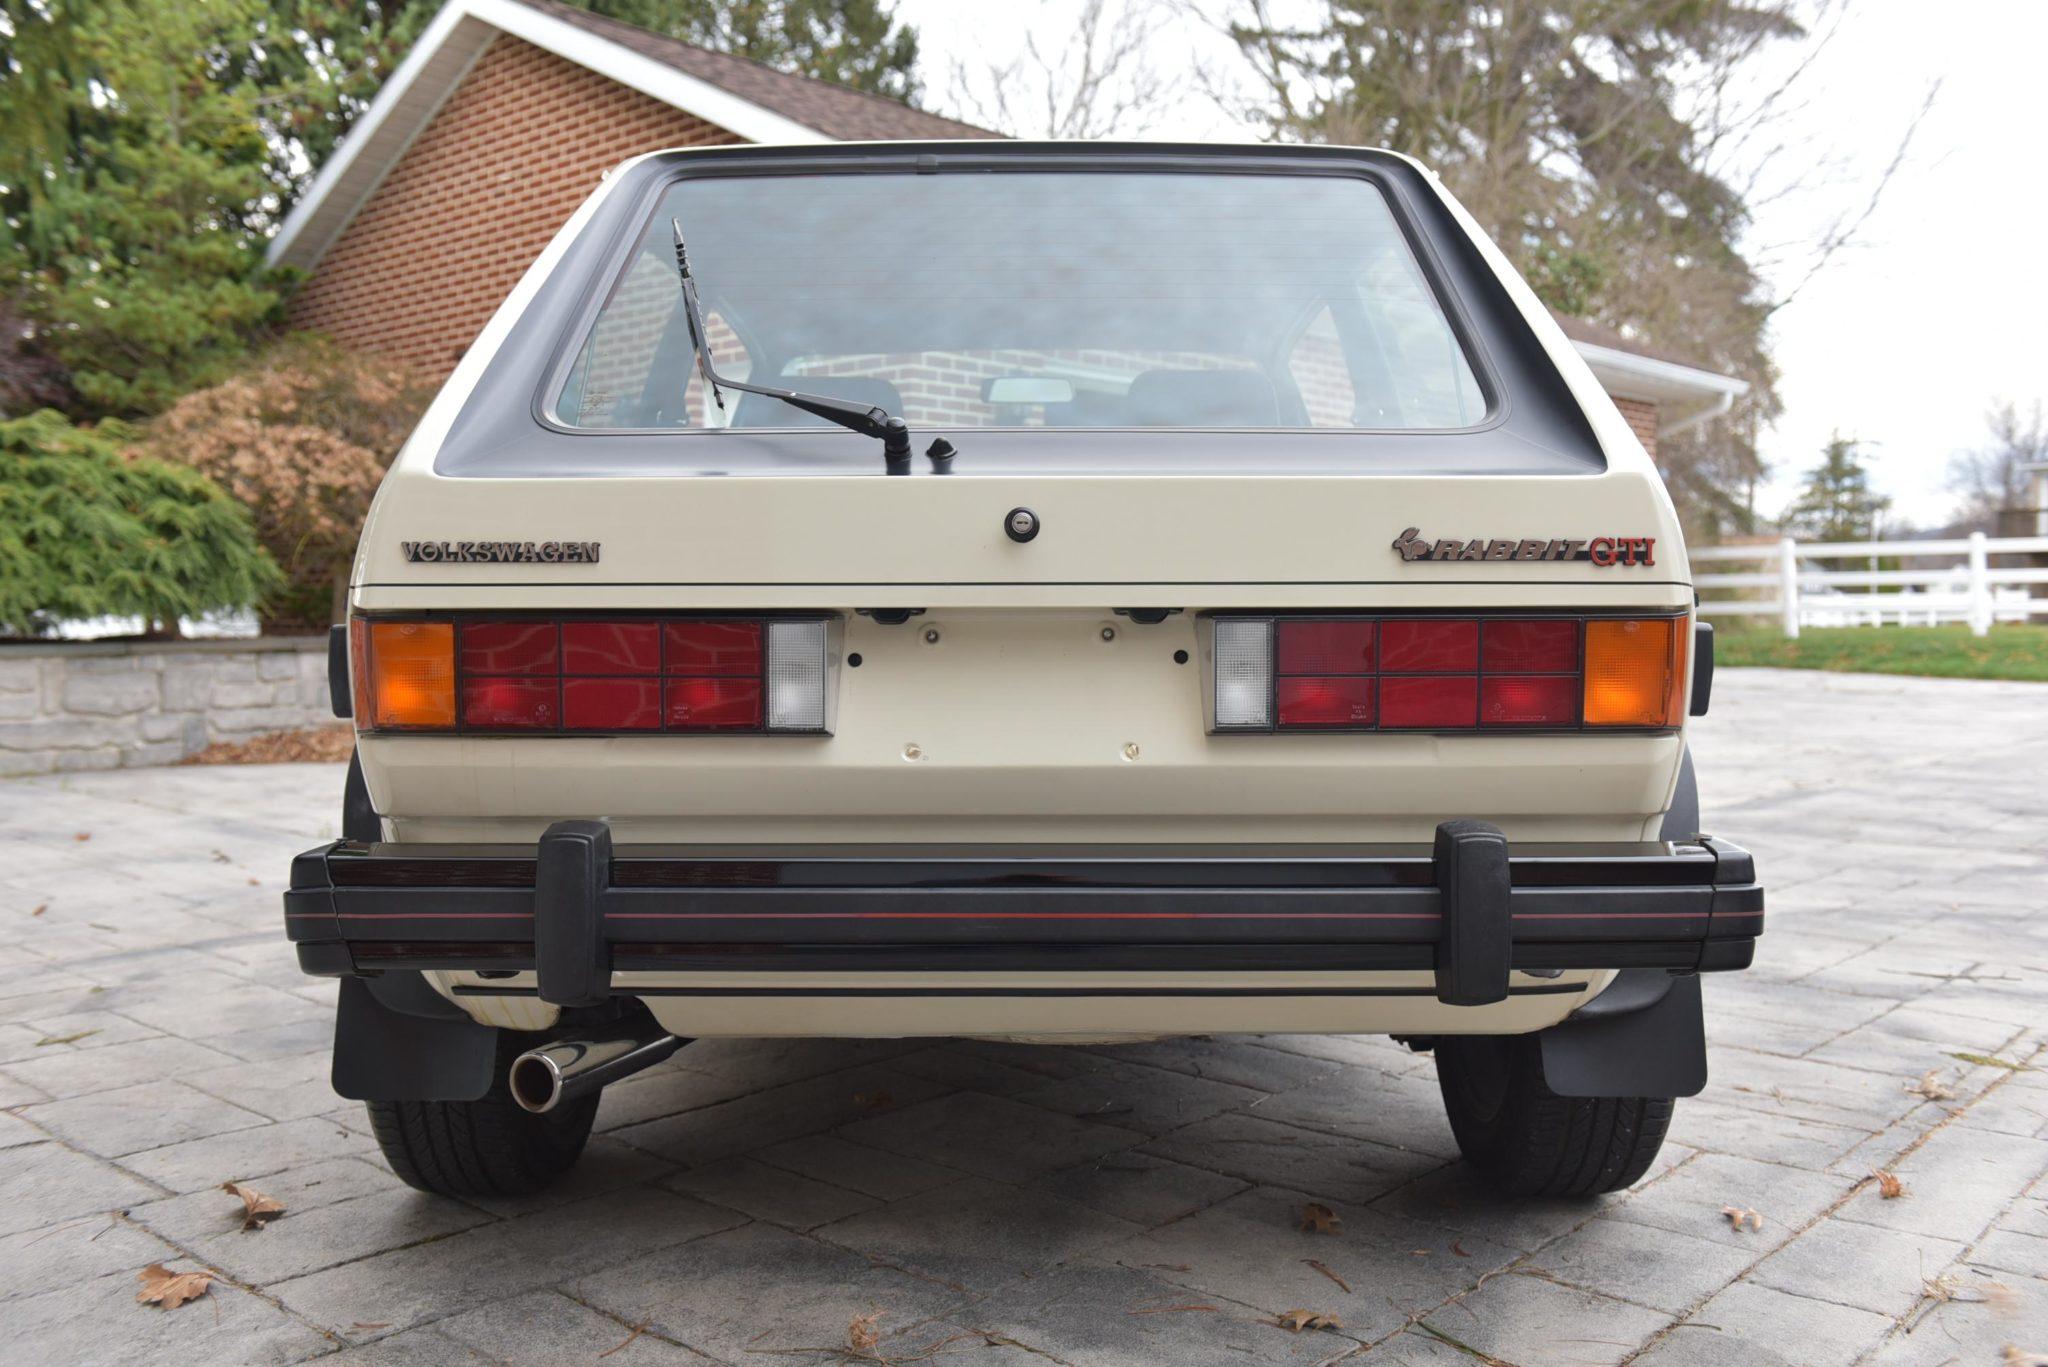 1983_volkswagen_rabbit_gti_1587038929e7b9c27f8dLEM_9898-scaled